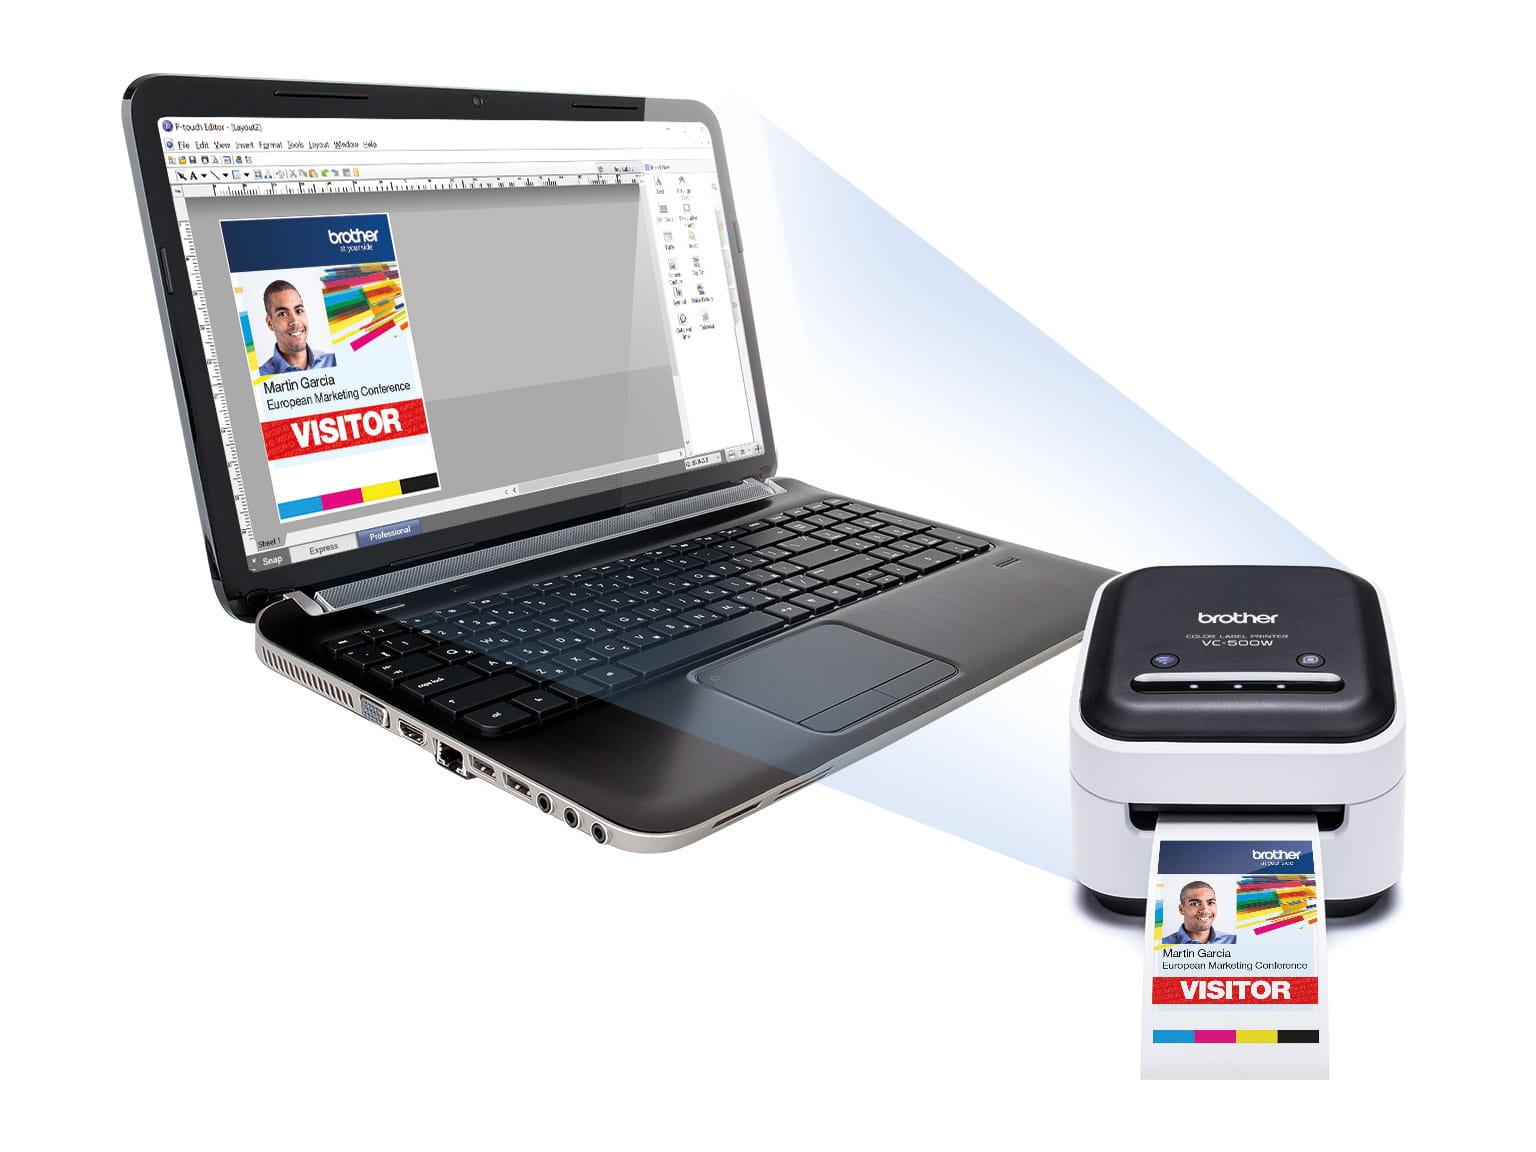 VC-500W farvelabelprinter og bærbar computer